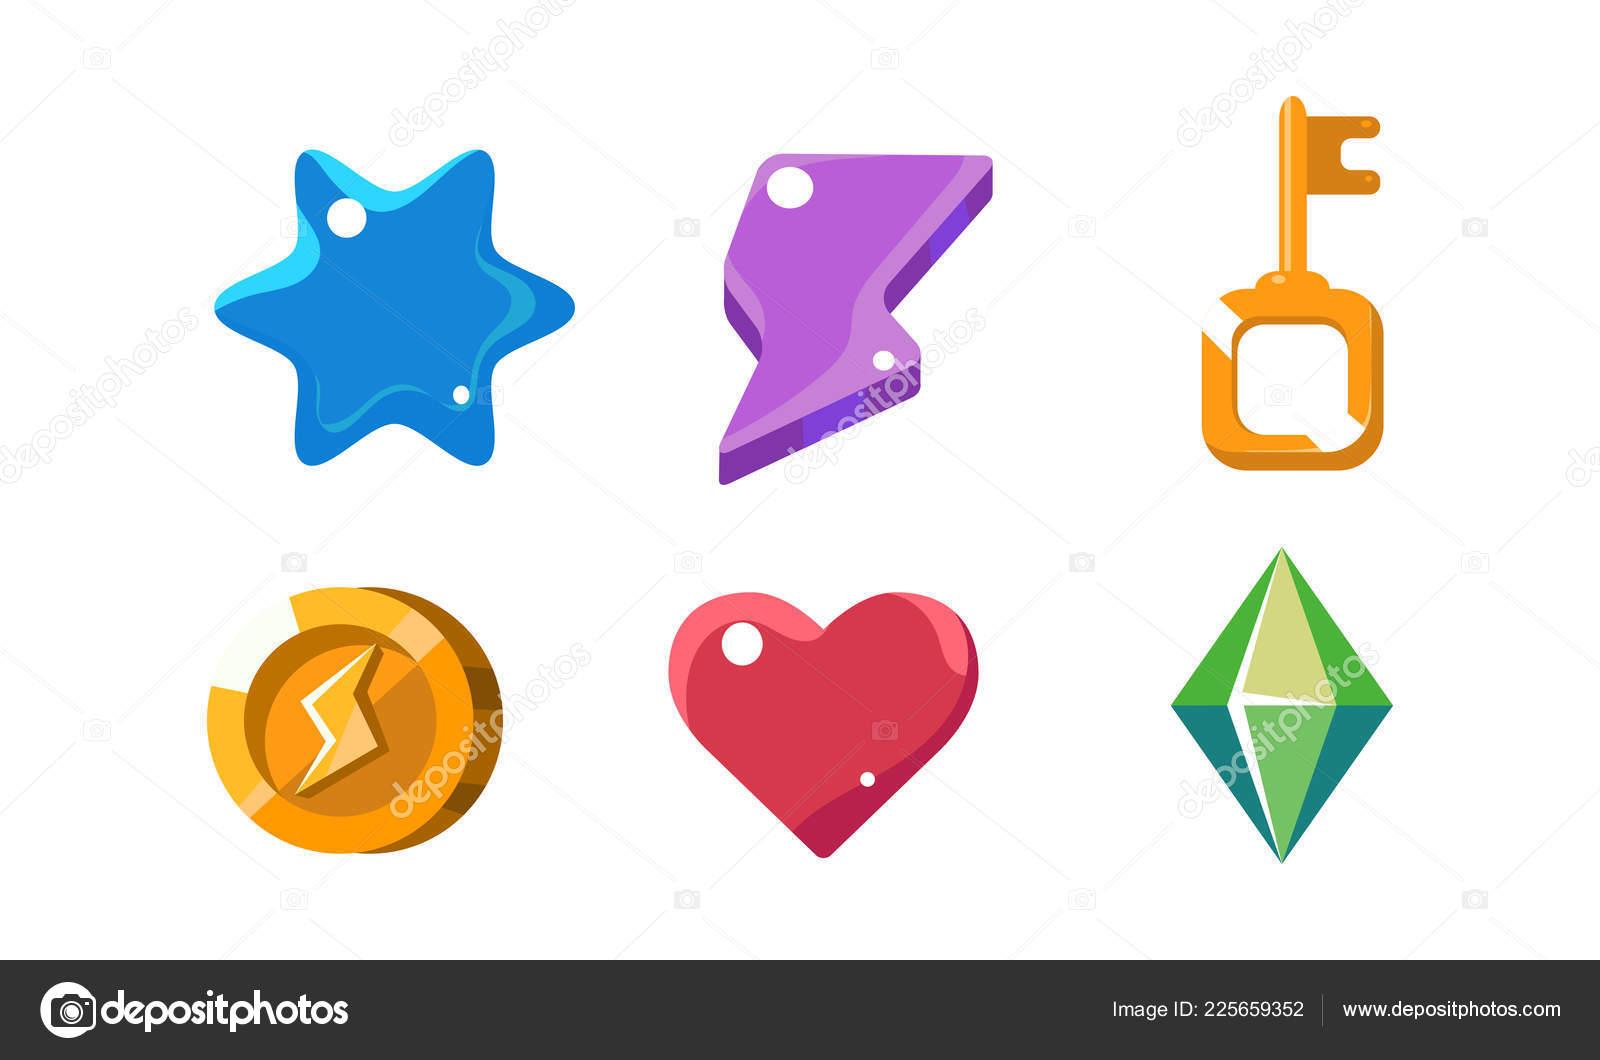 Colorful bright jelly shapes set, crystal, key, lightning